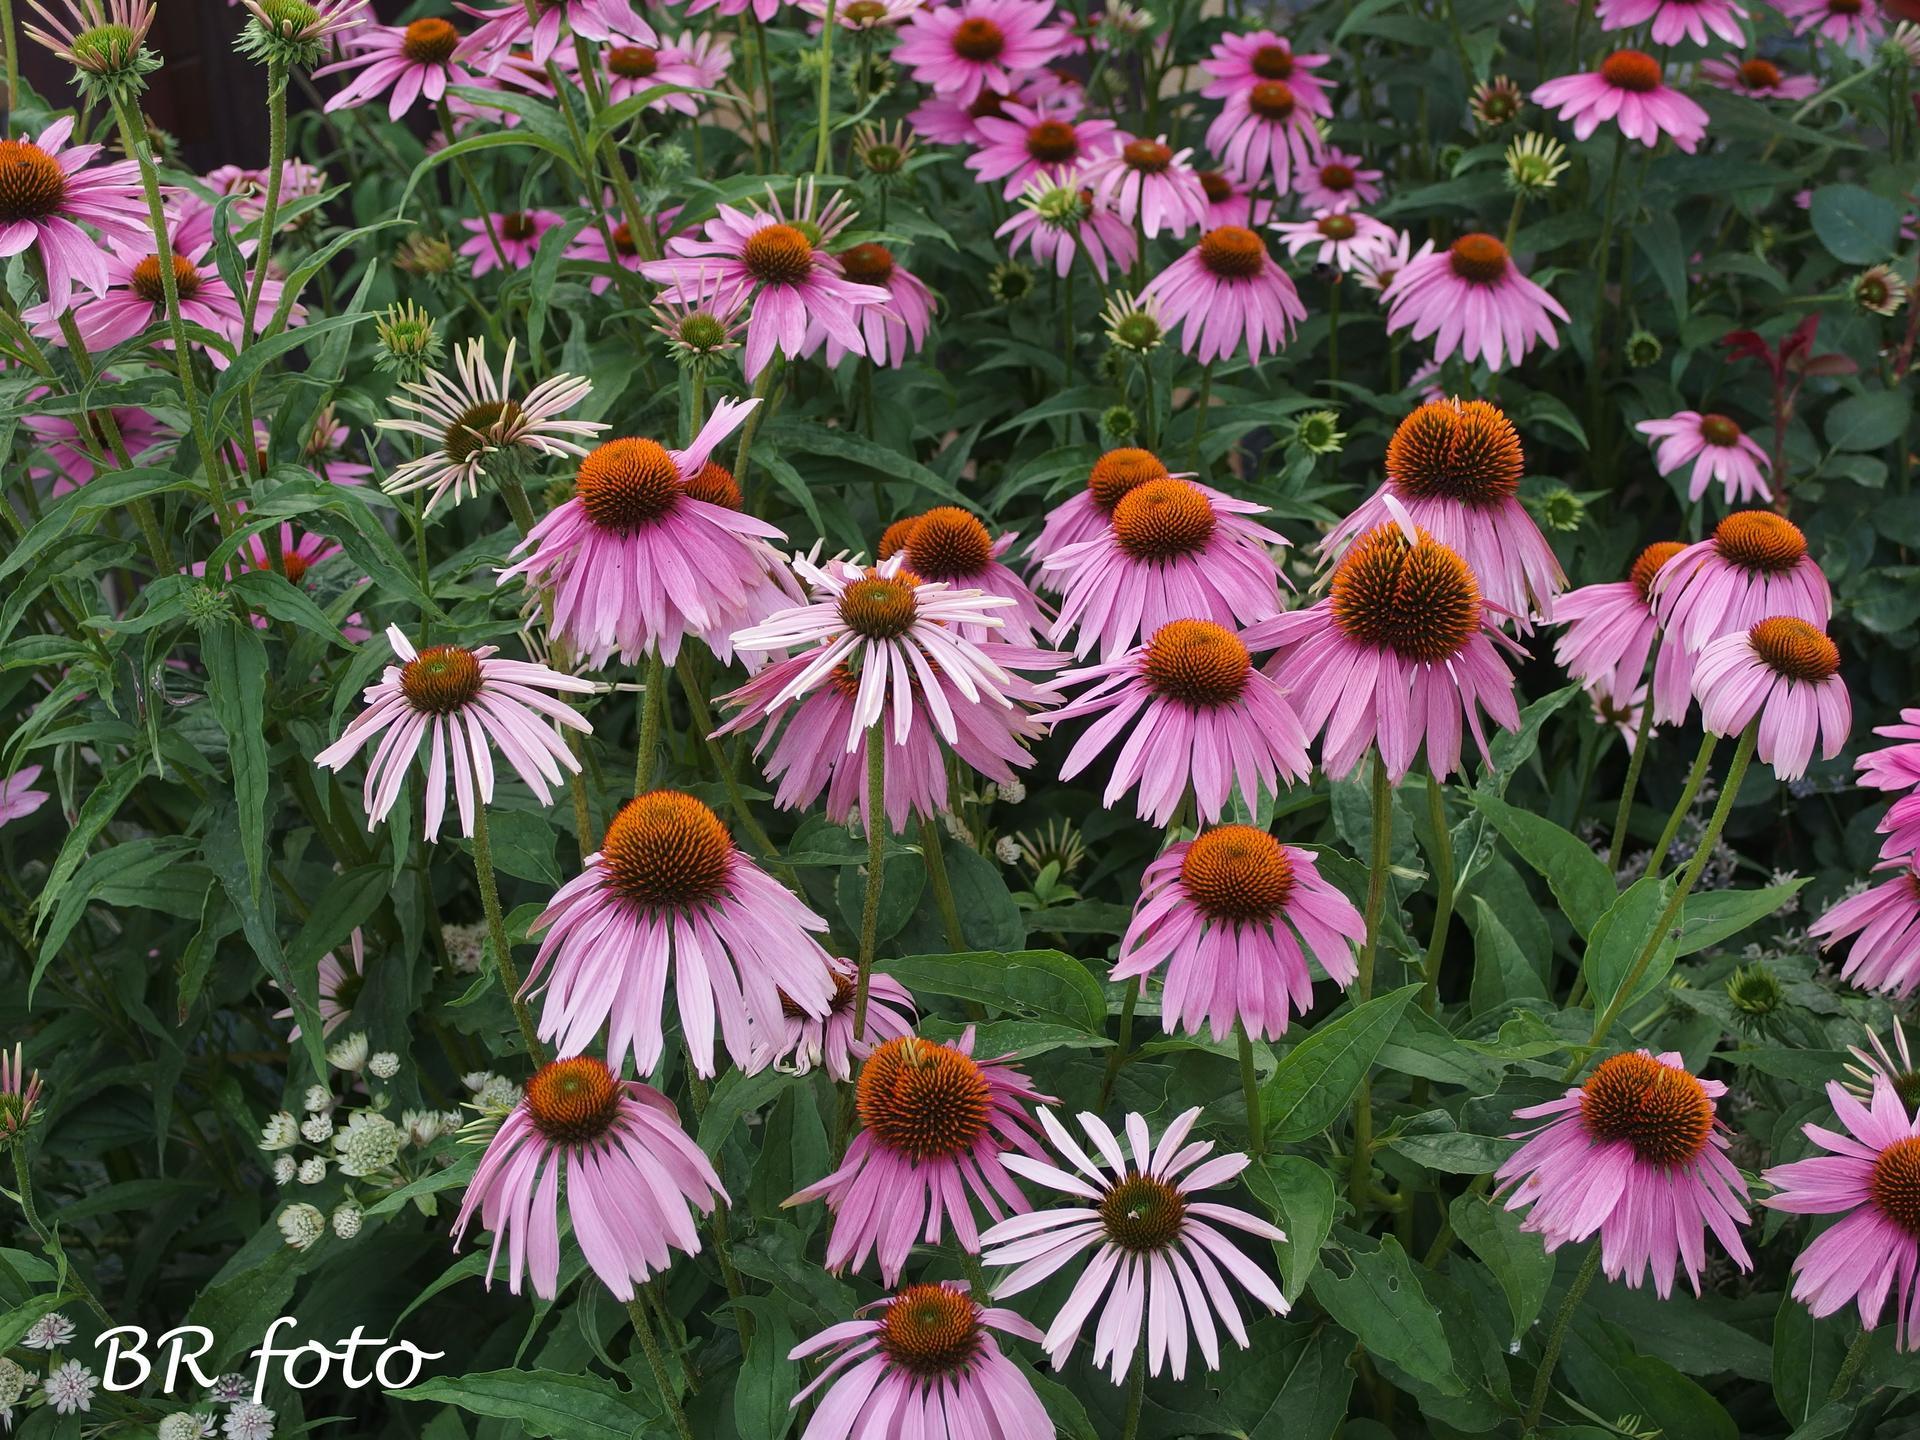 Zahrada v létě - echinacea